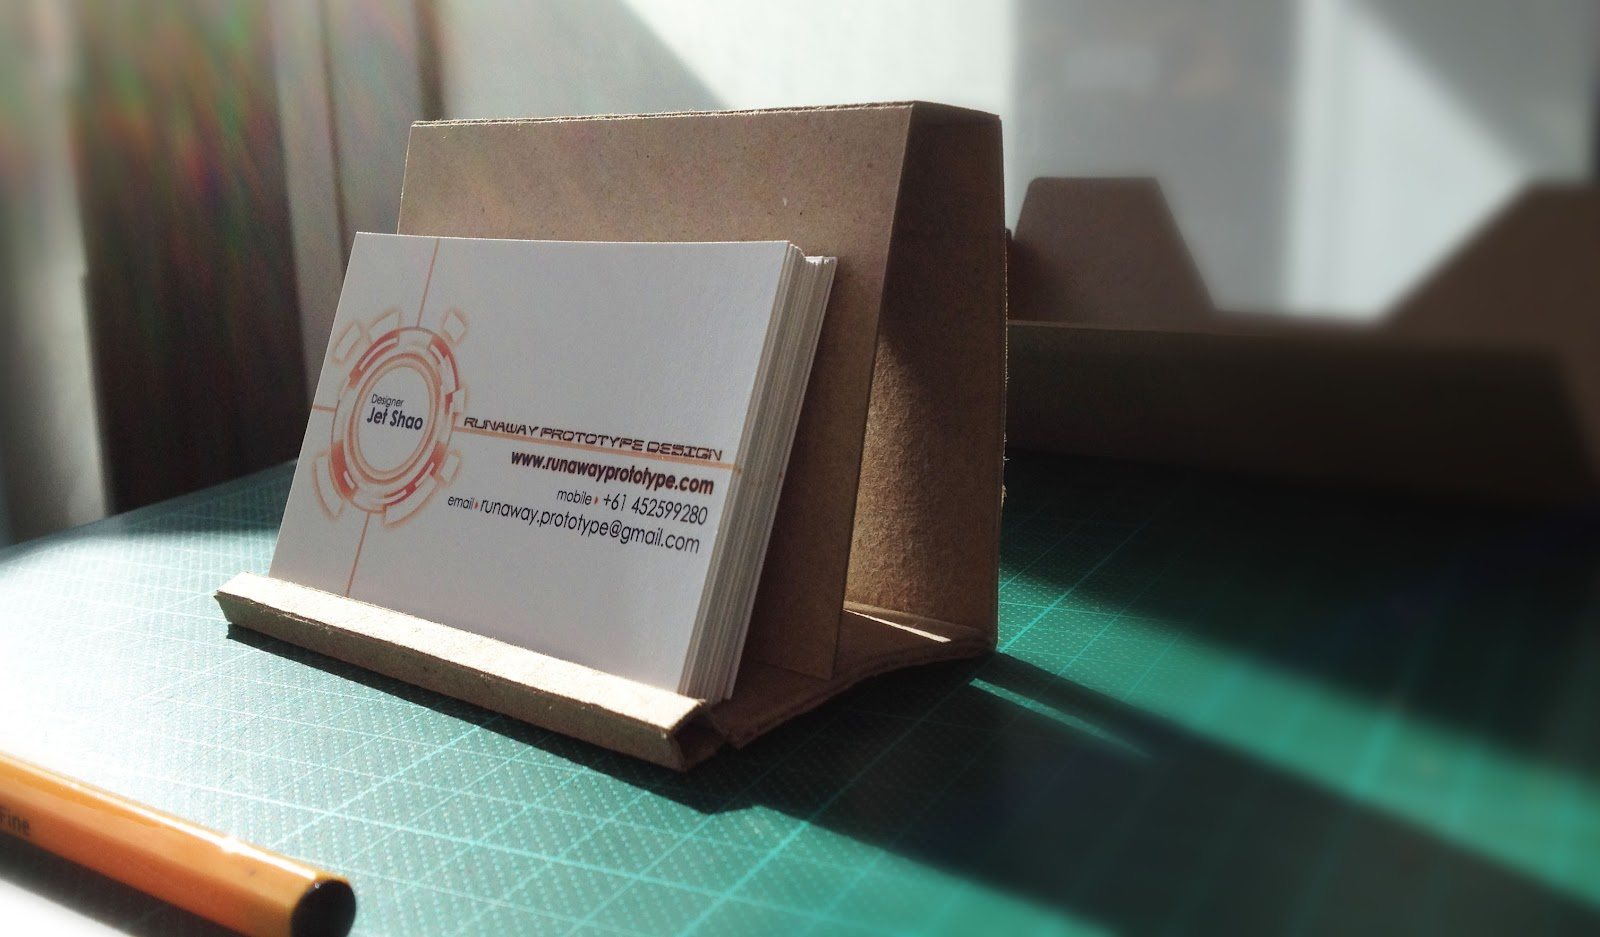 Runaway Prototype Design: Cardboard business card holder